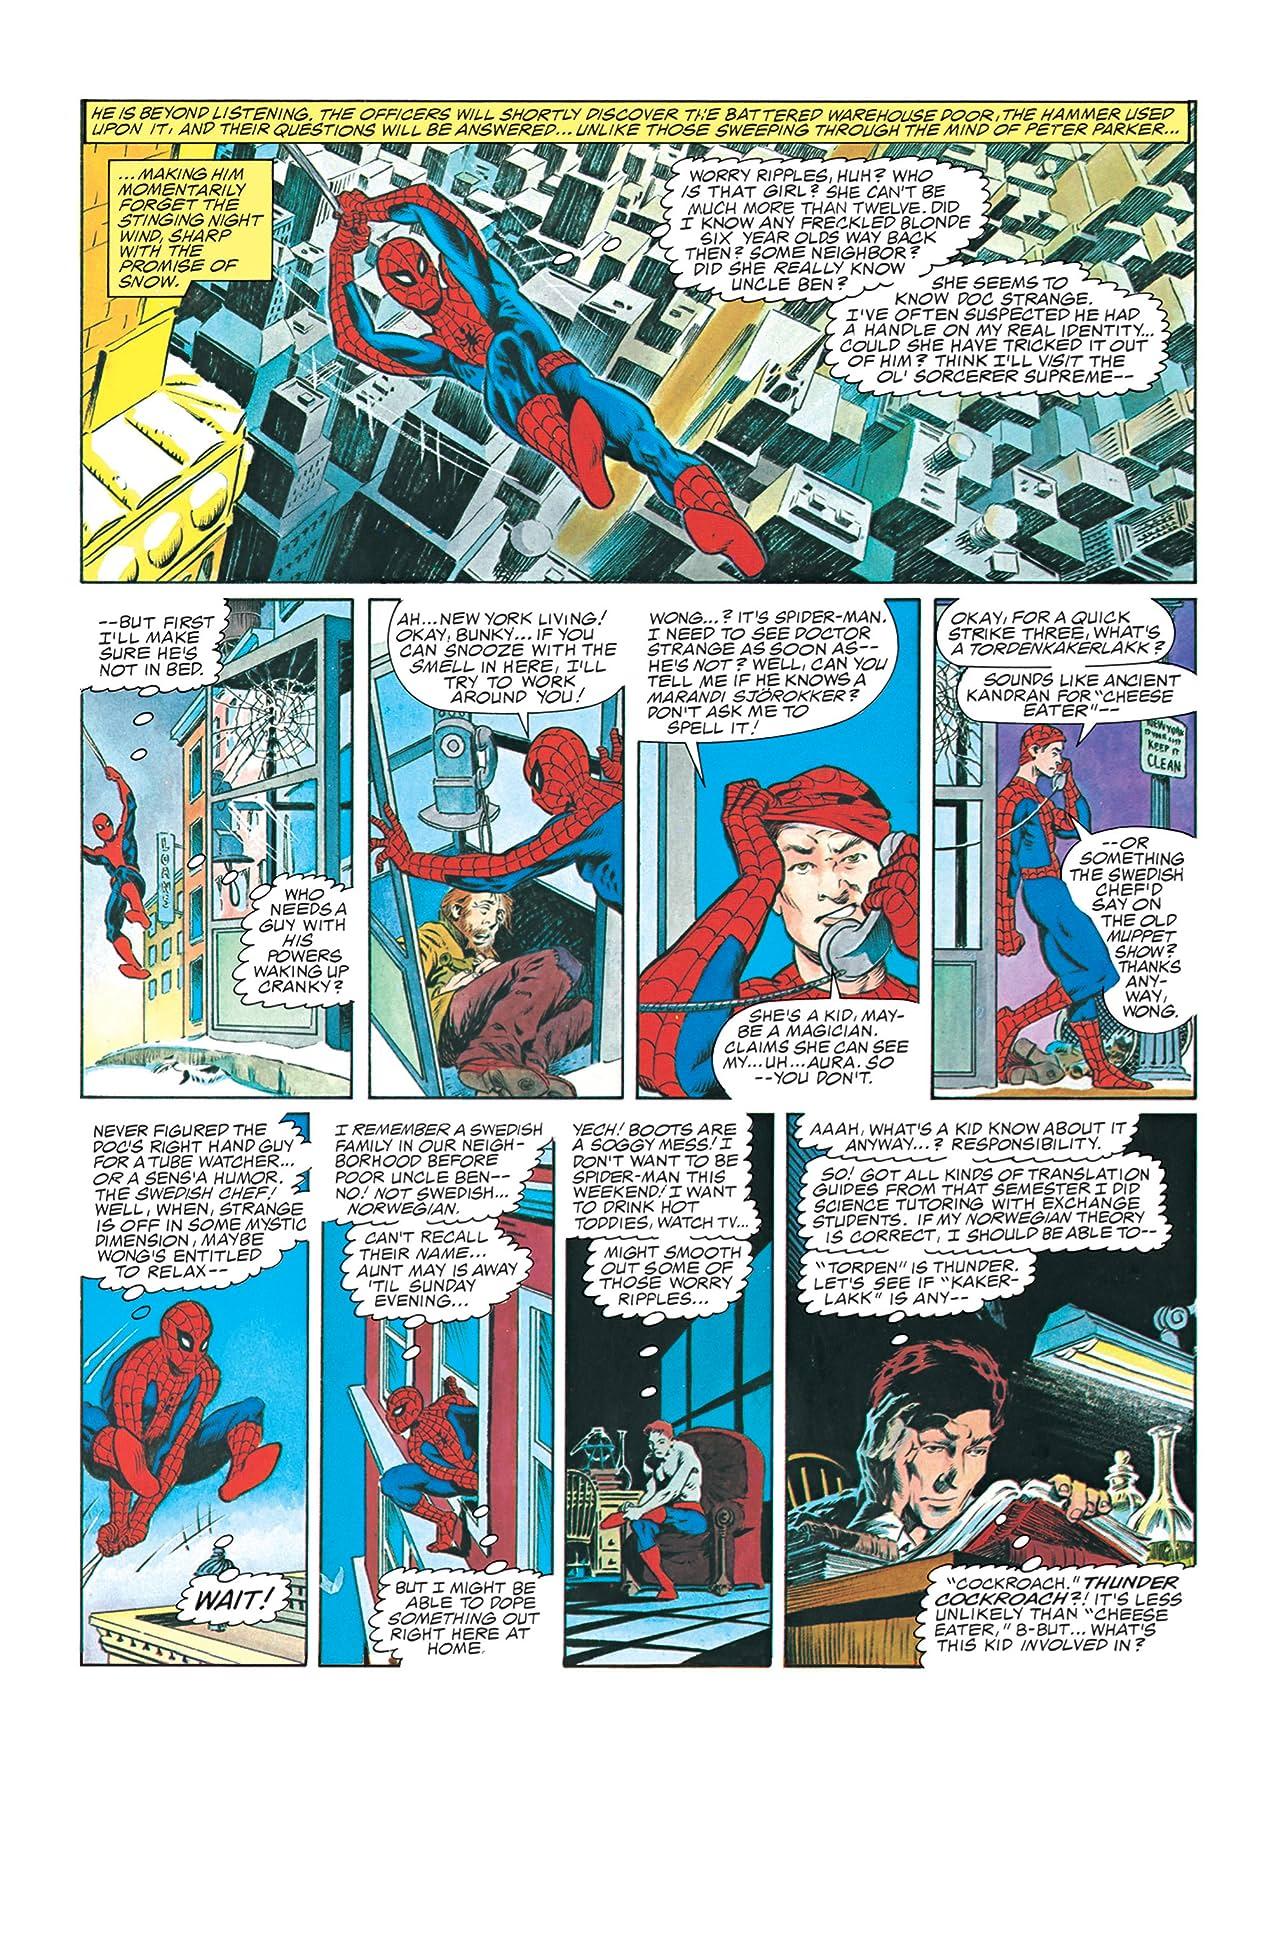 Amazing Spider-Man Hooky #1